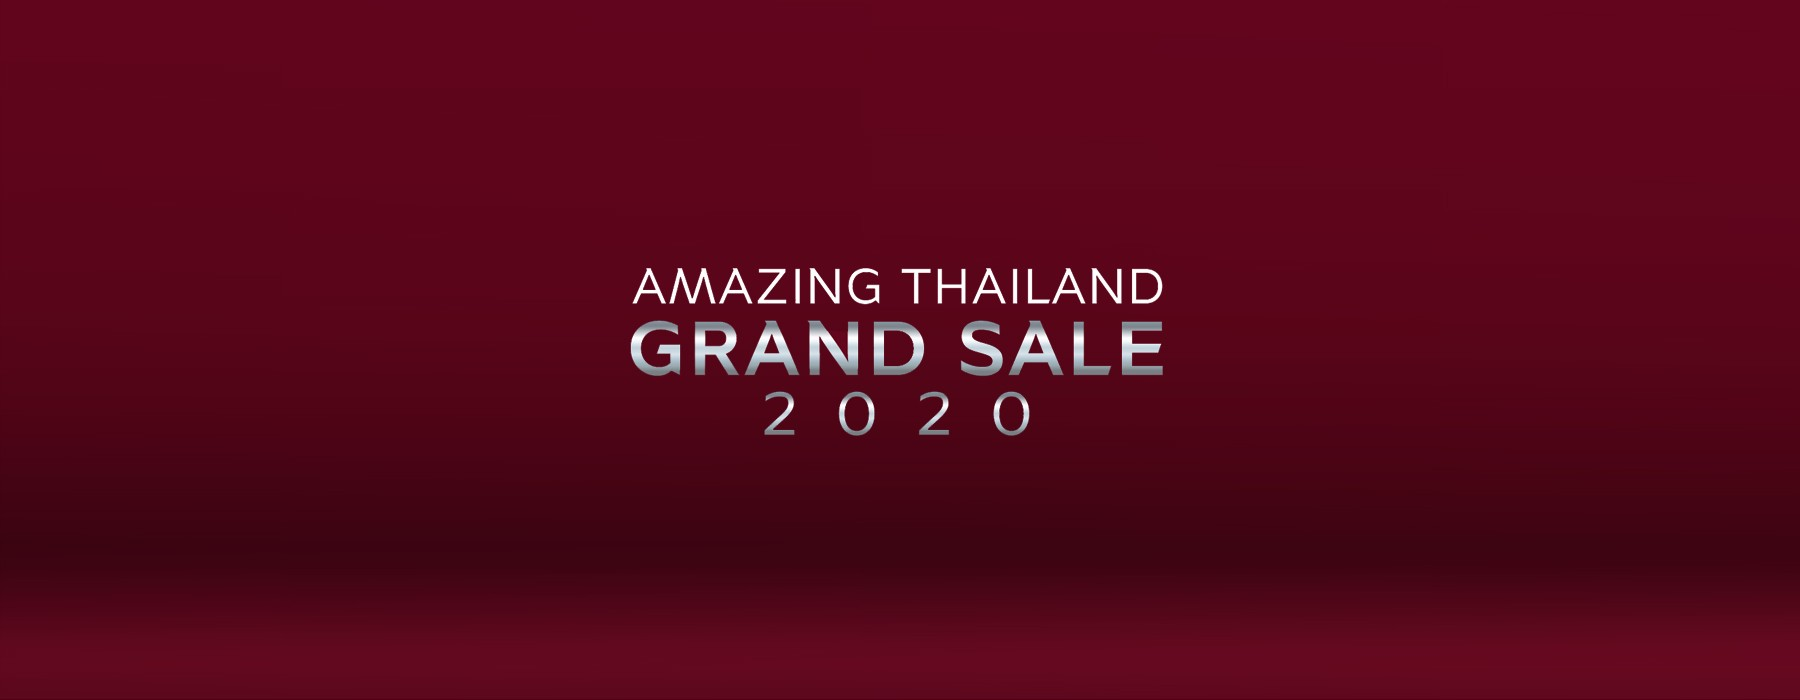 amazing-thailand-grand-sale